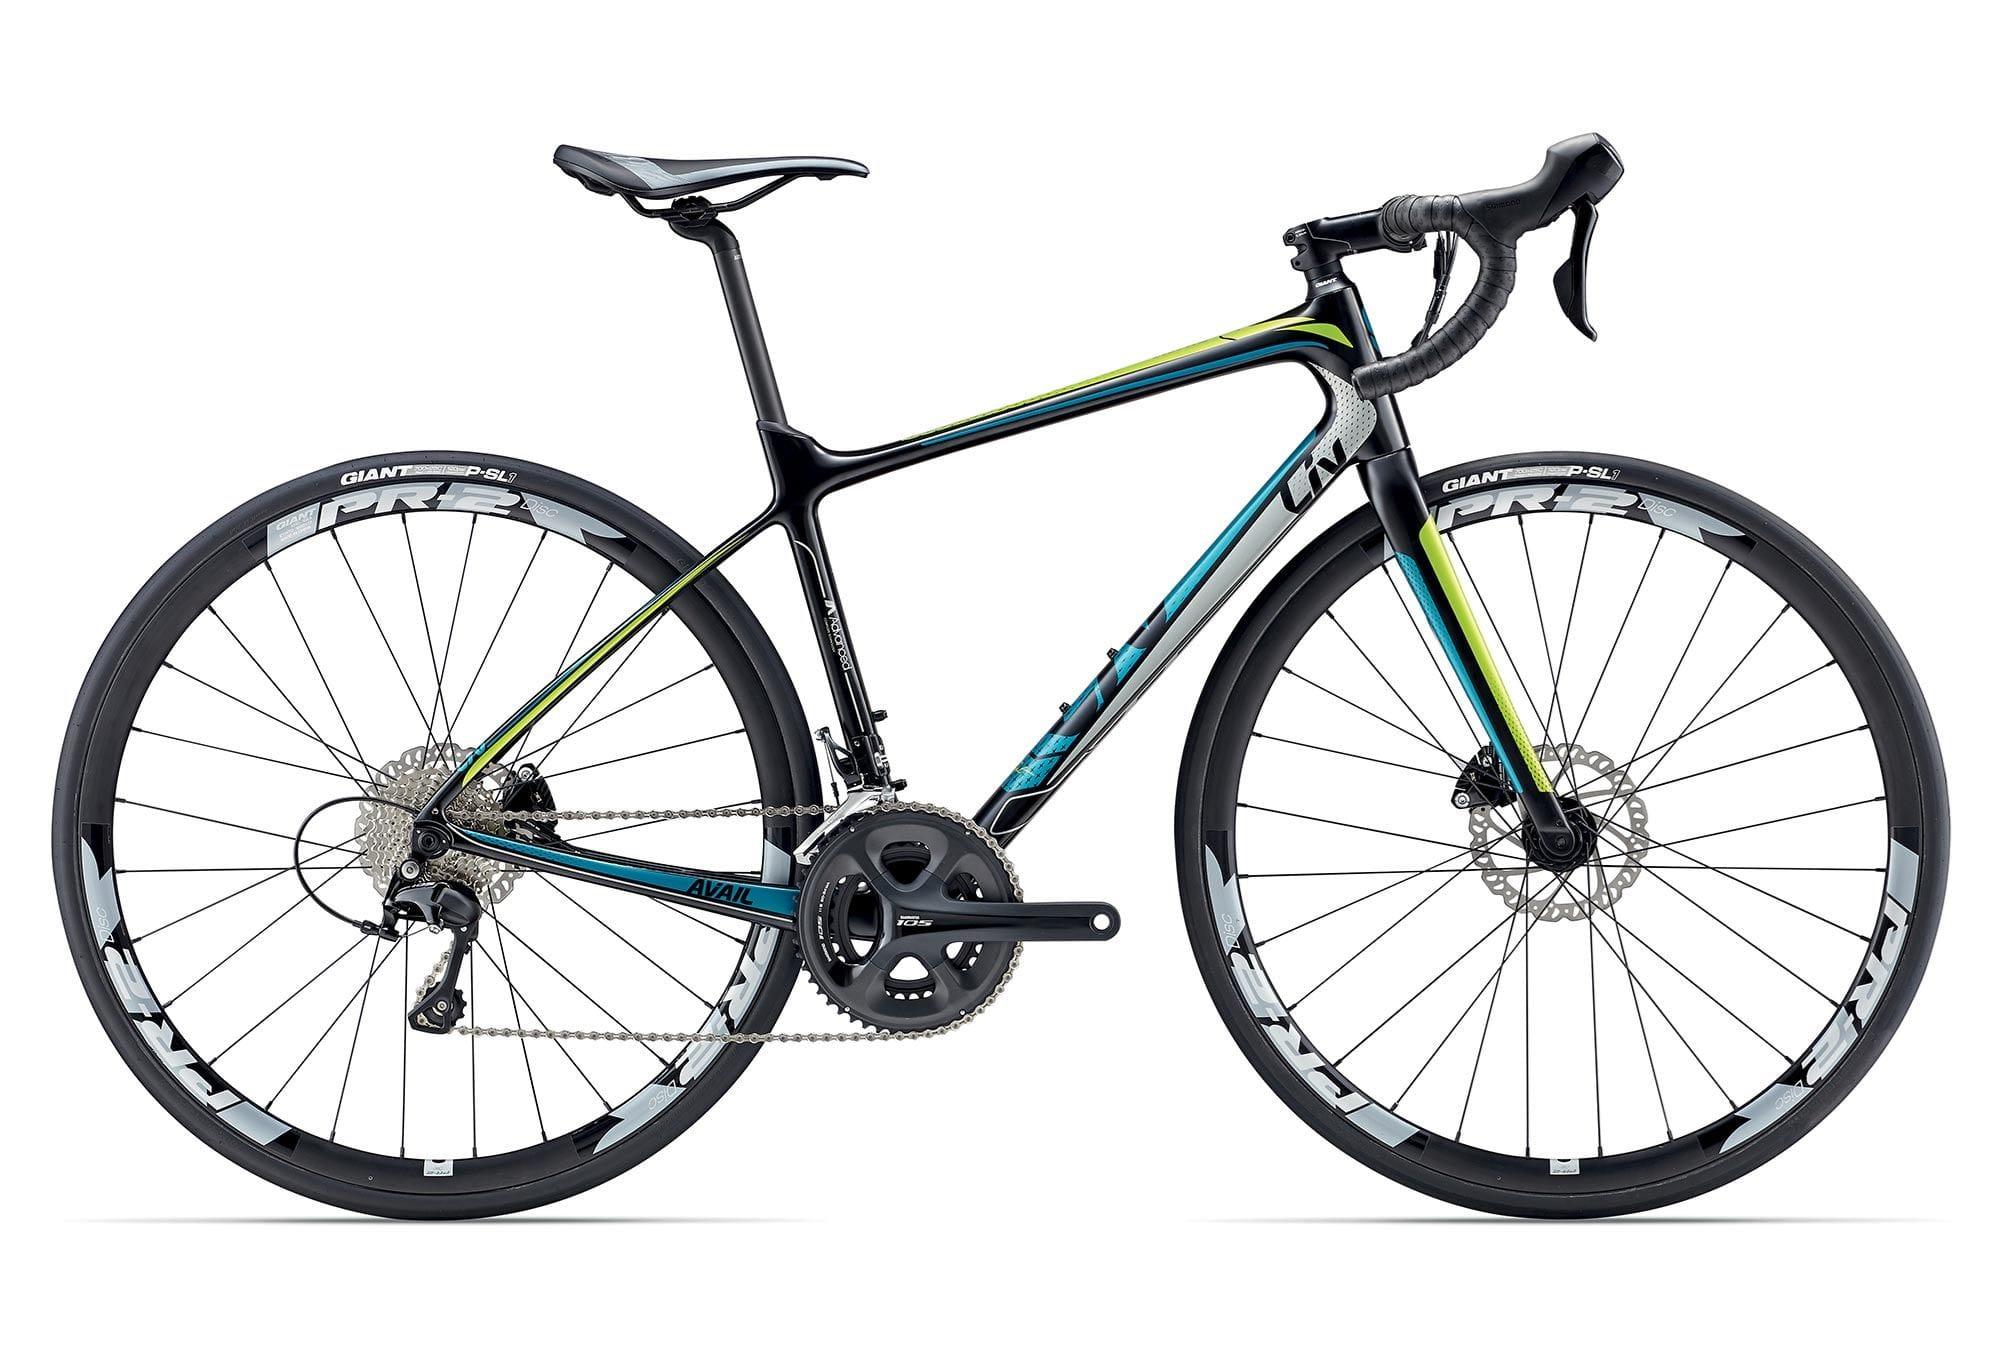 Giant Liv Avail Advanced 2 Road Bike 2017 All Terrain Cycles